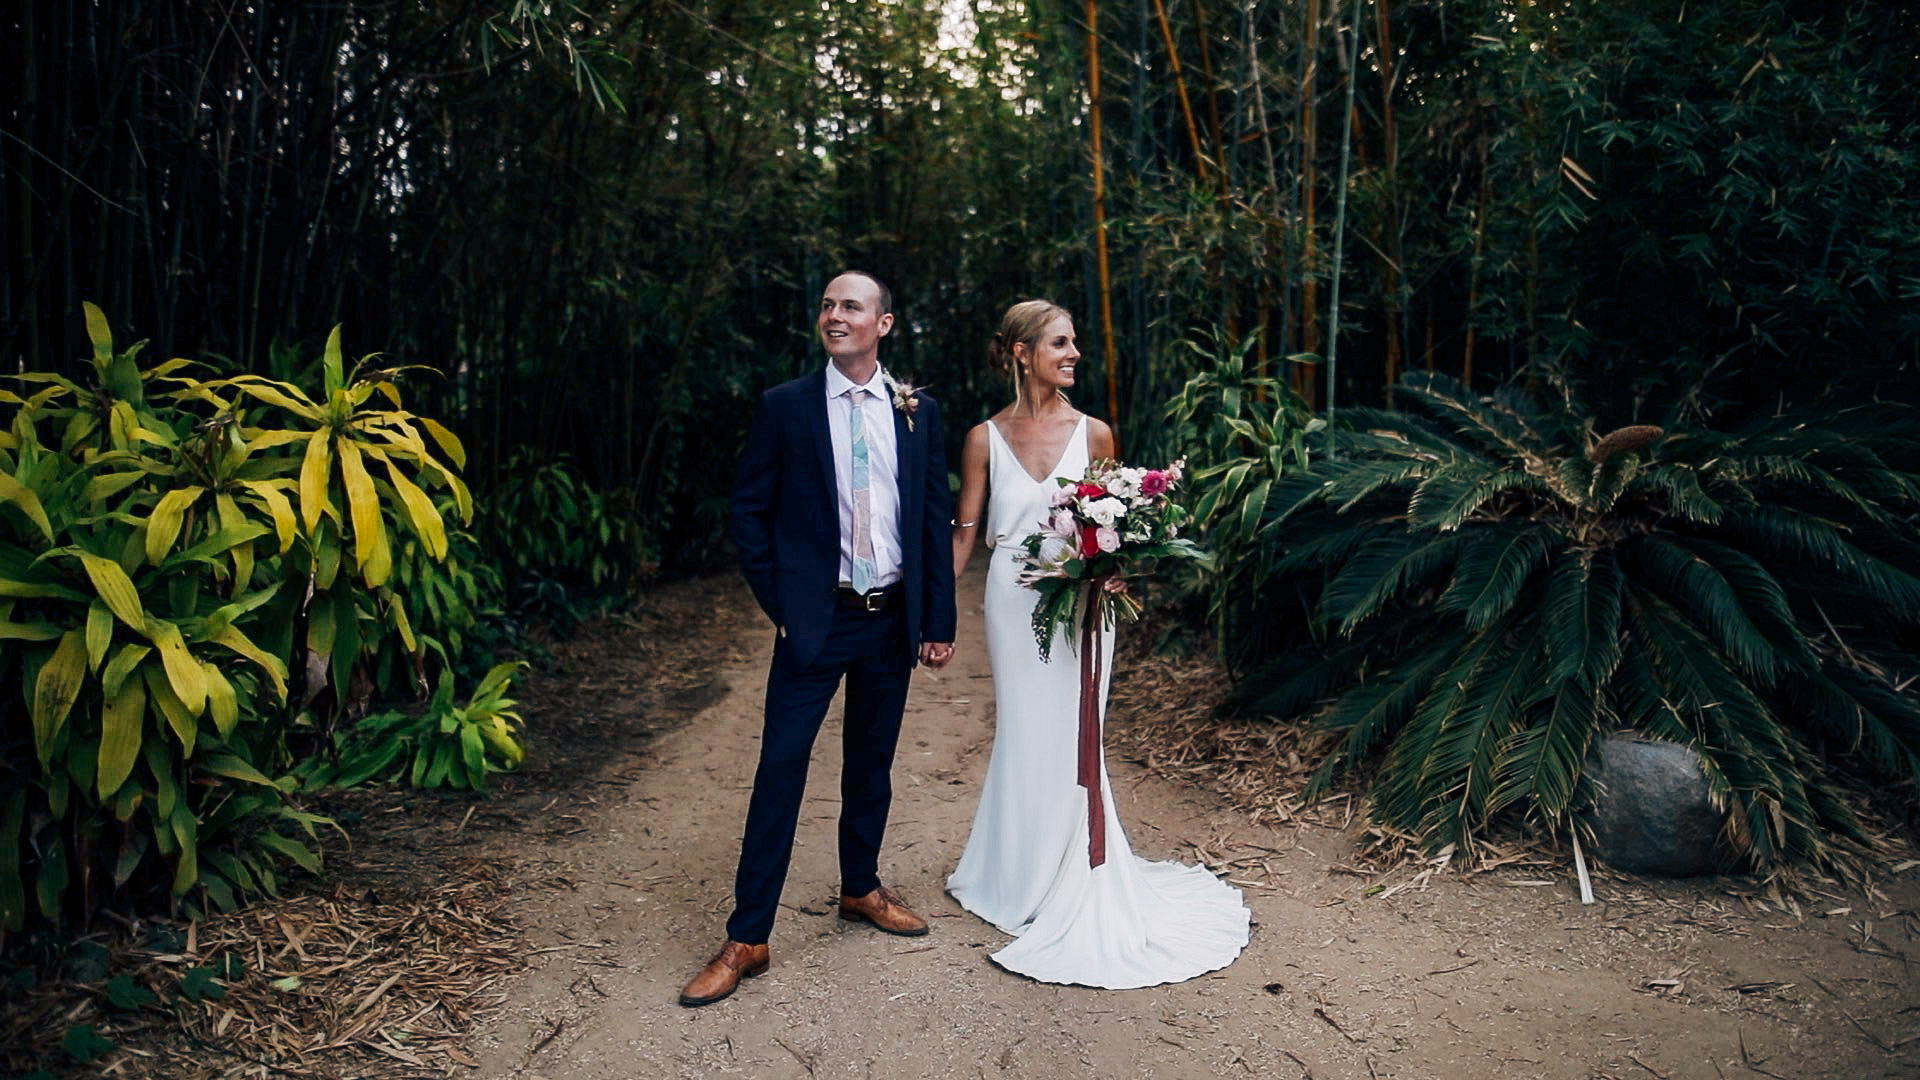 Lyndsey + Nick | San Diego, California | San Diego Botanical Gardens